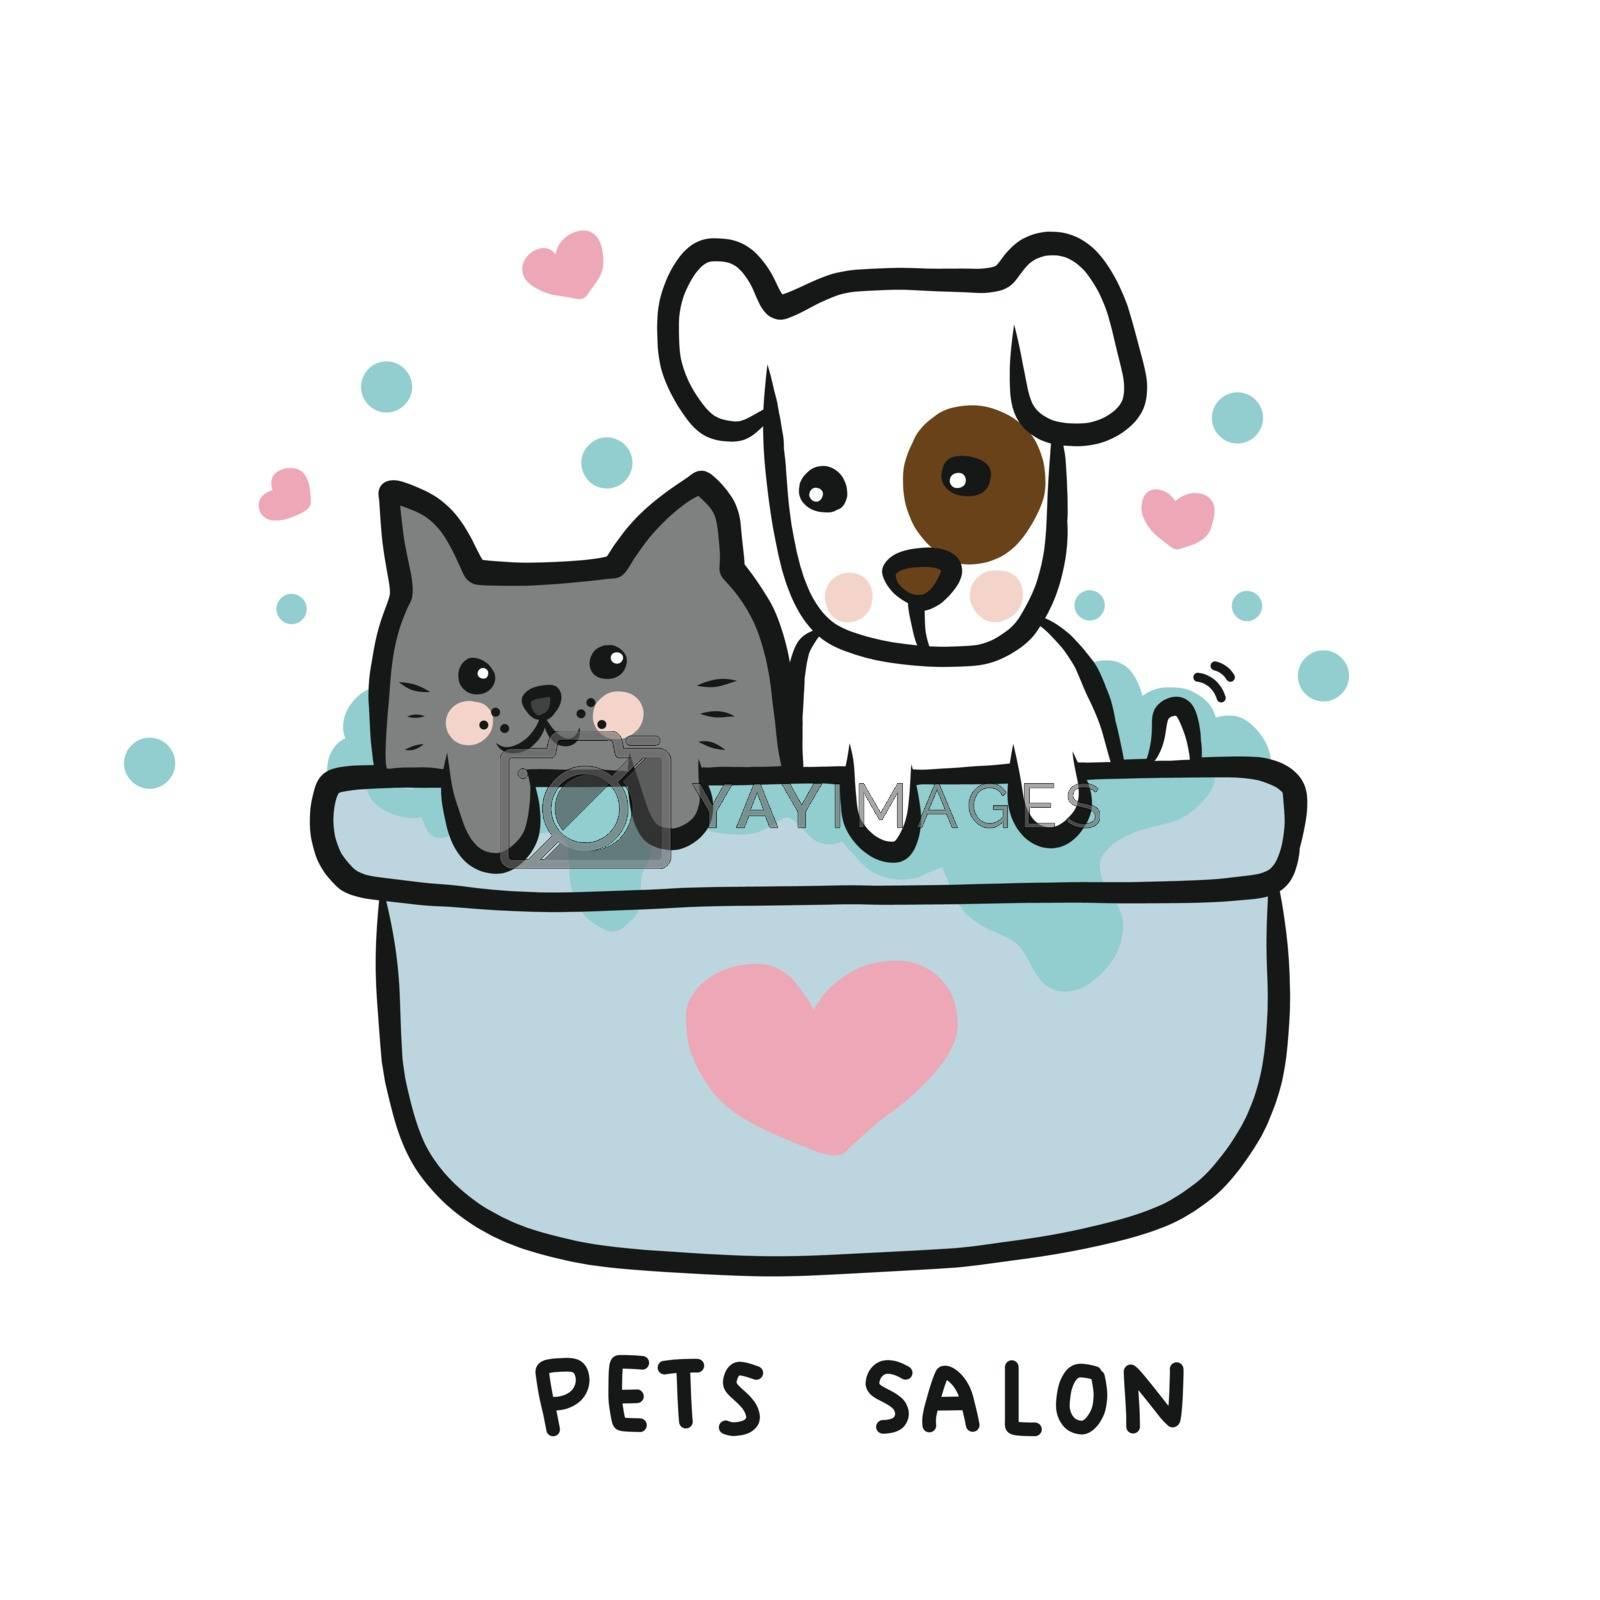 Dog and cat in shower bathtub , pets salon cartoon vector illustration doodle style